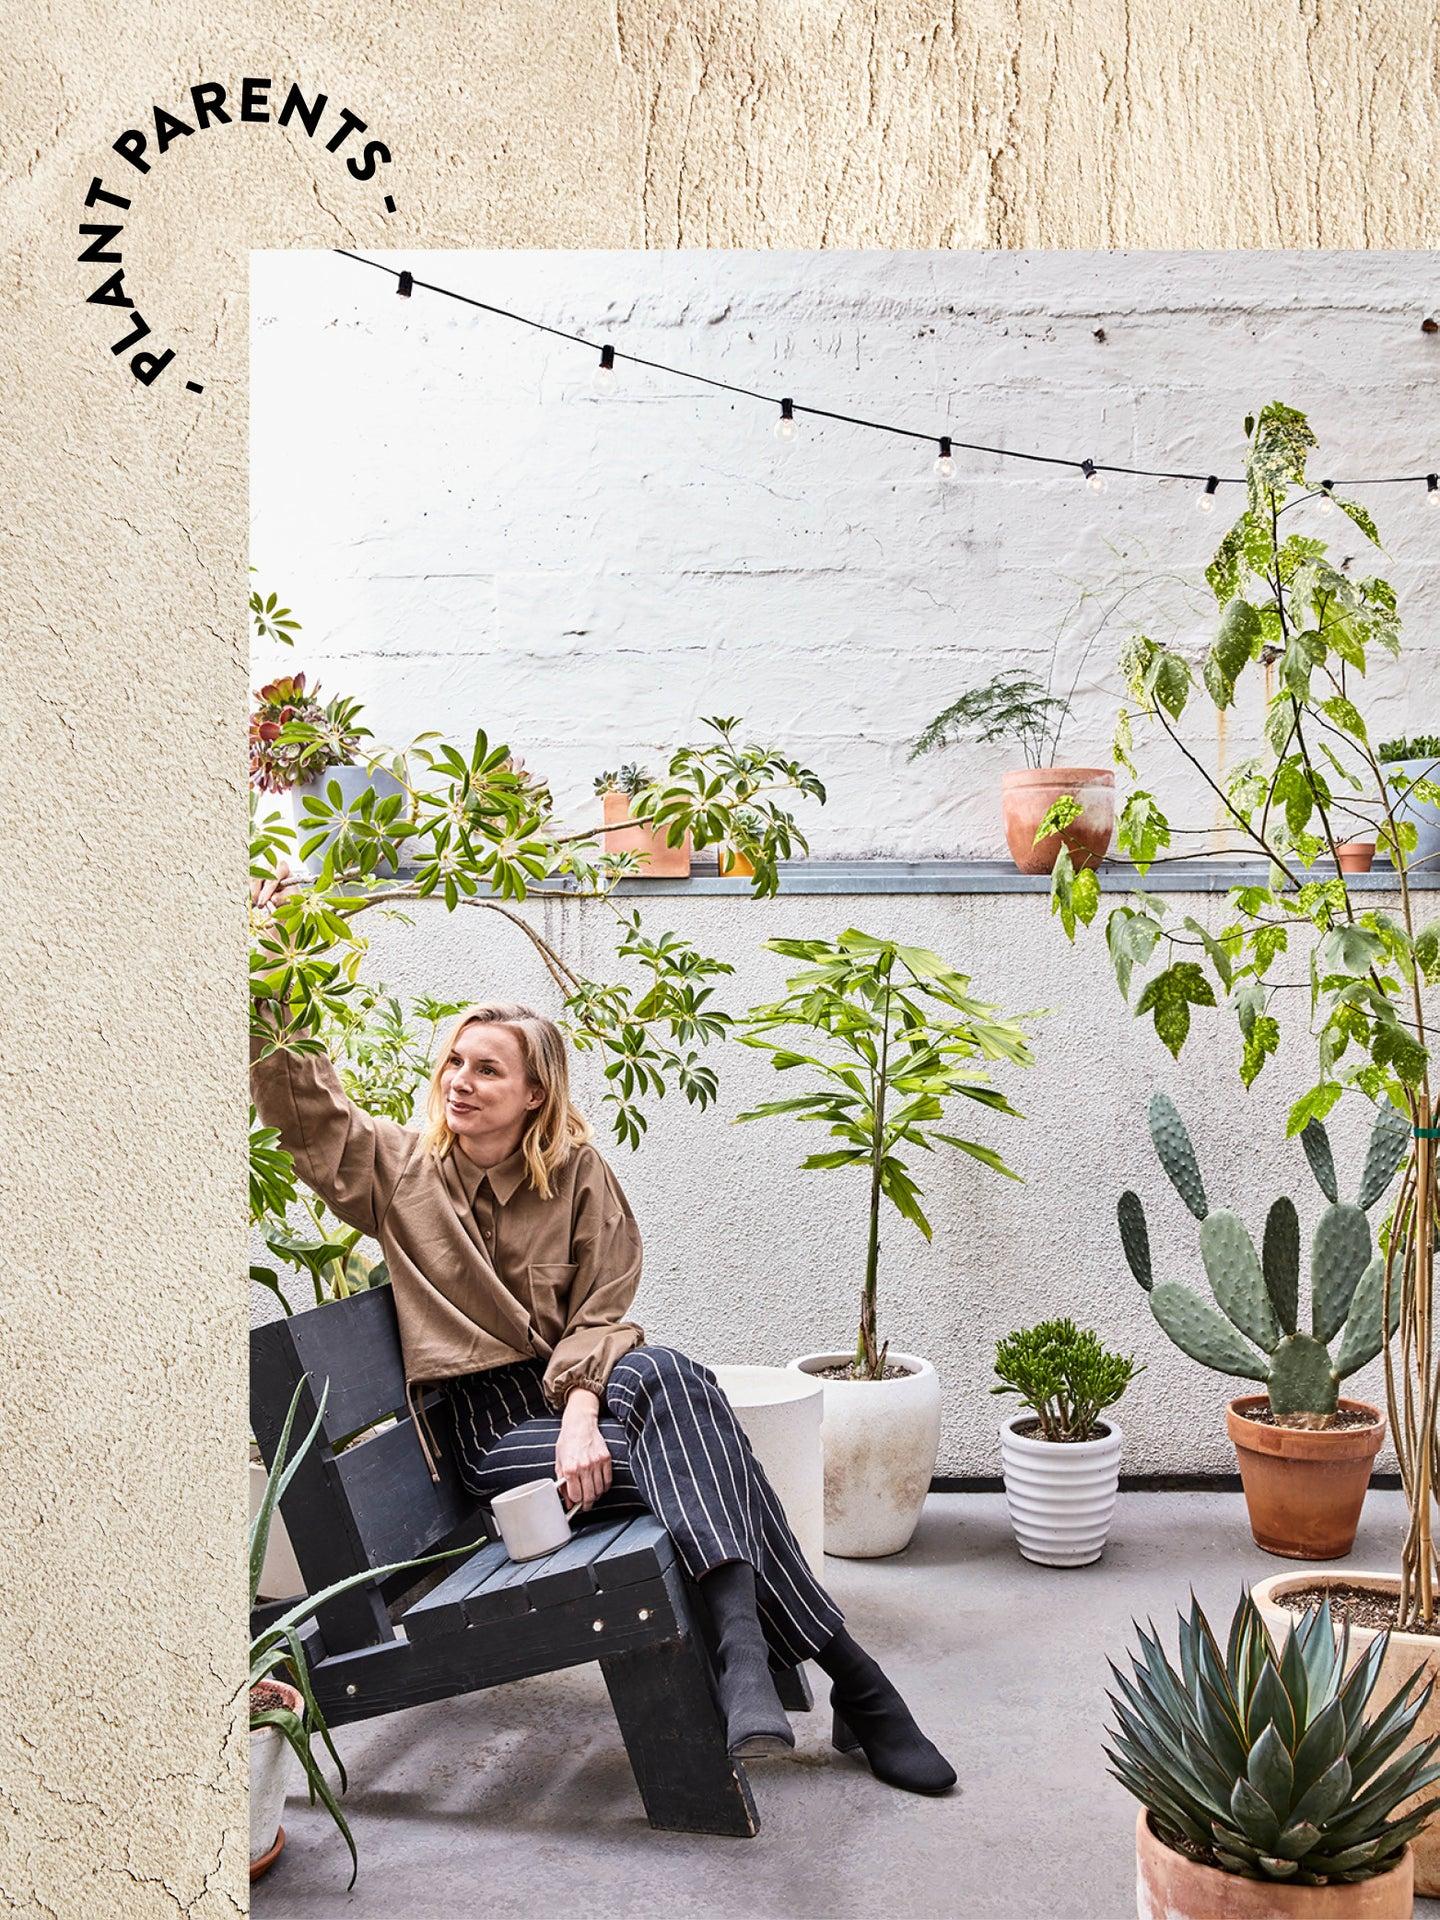 woman in a chair in an outdoor garden